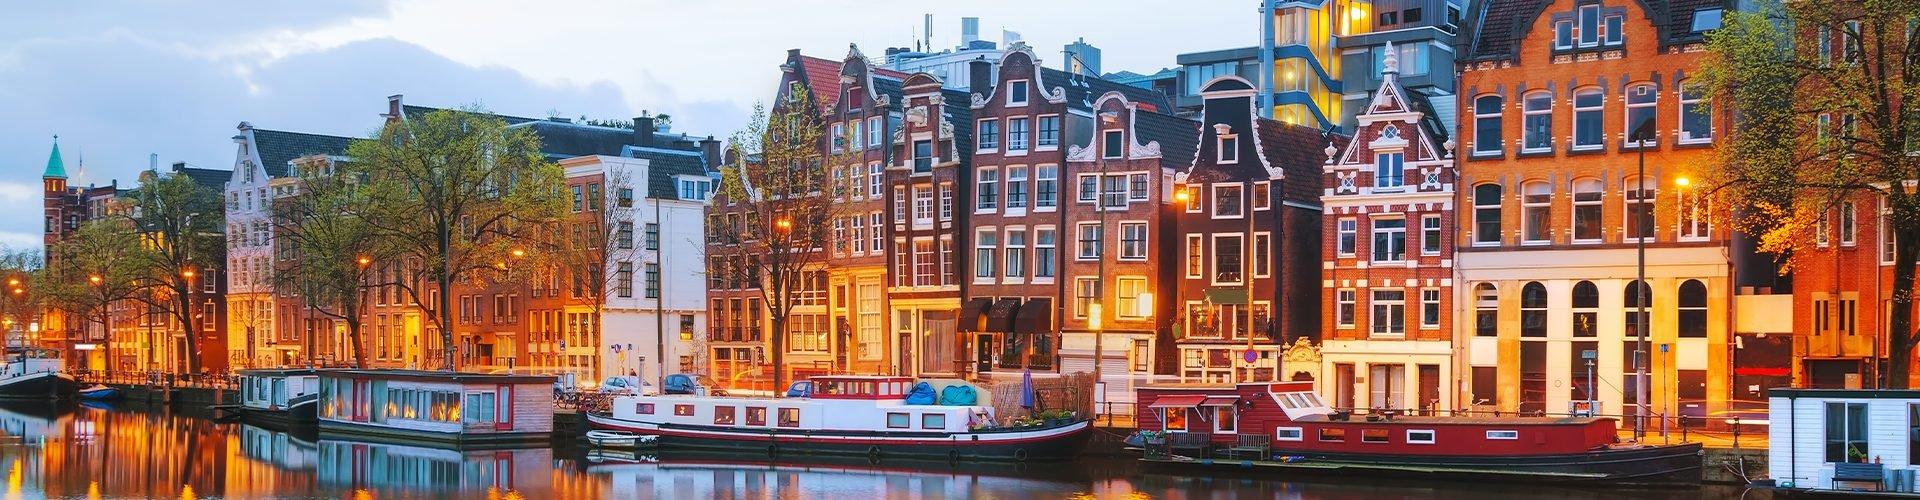 Familienurlaub in Amsterdam